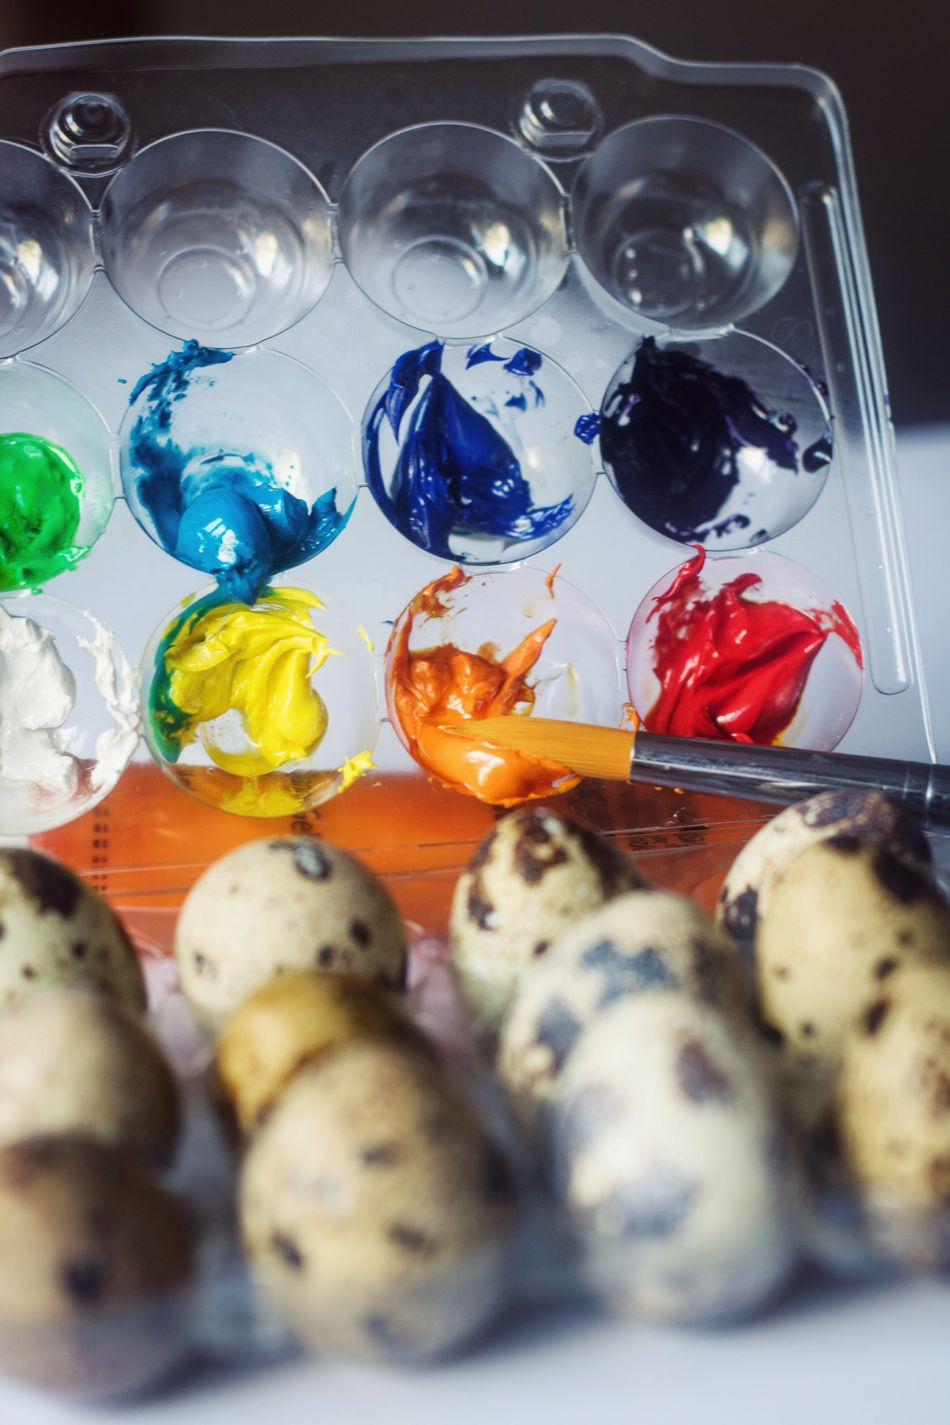 Still Life Quail Eggs Easter Food Close-up Art Decoration Selebraiting Creative Paint Colorful